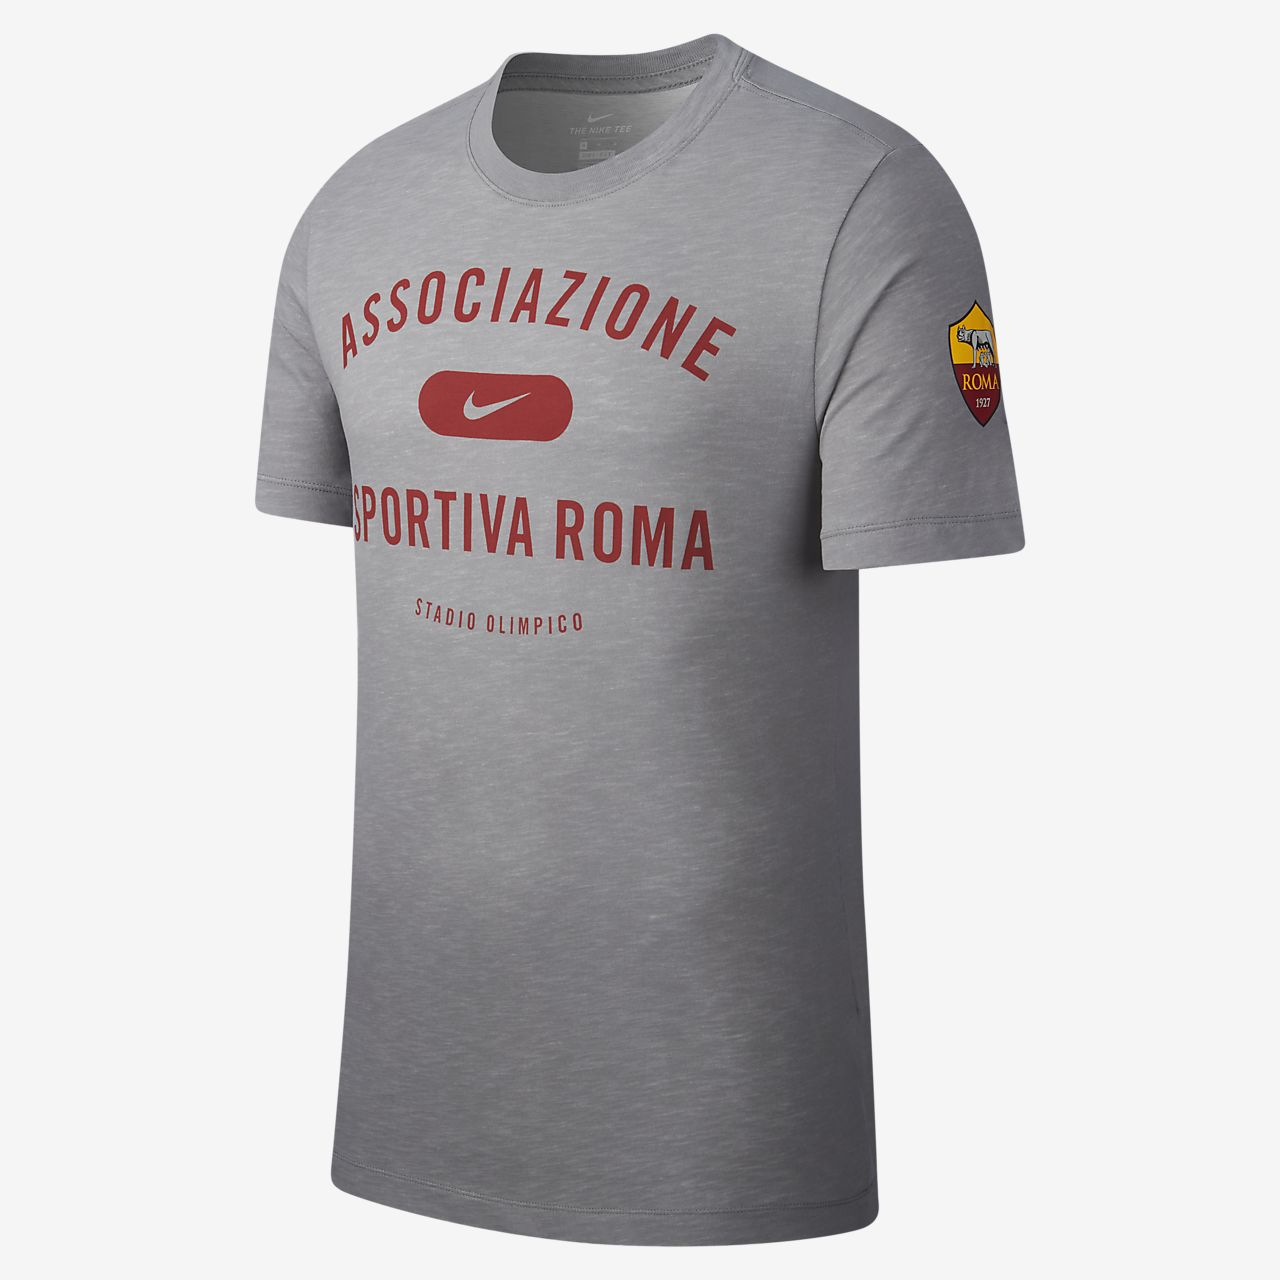 Nike Dri-FIT A.S. Roma Camiseta de fútbol - Hombre. Nike.com ES 3392d5e9c69ec